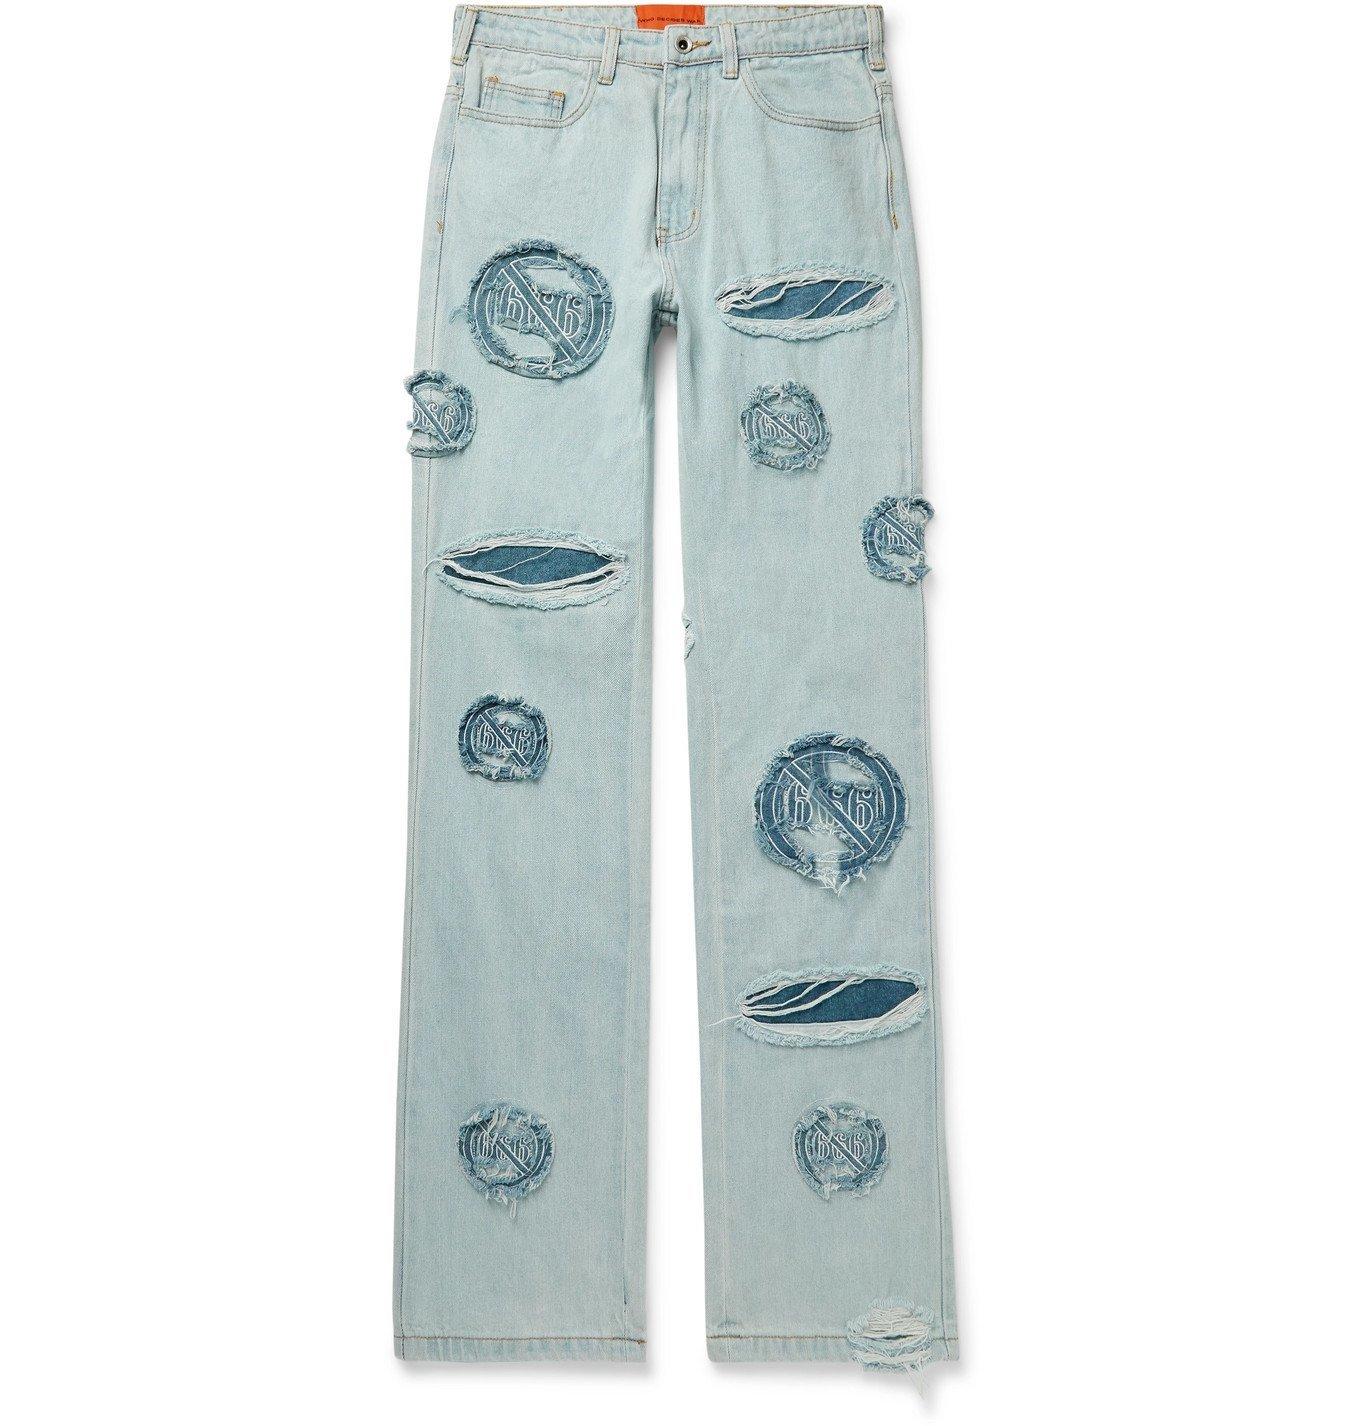 Photo: WHO DECIDES WAR by Ev Bravado - Distressed Appliquéd Denim Jeans - Blue